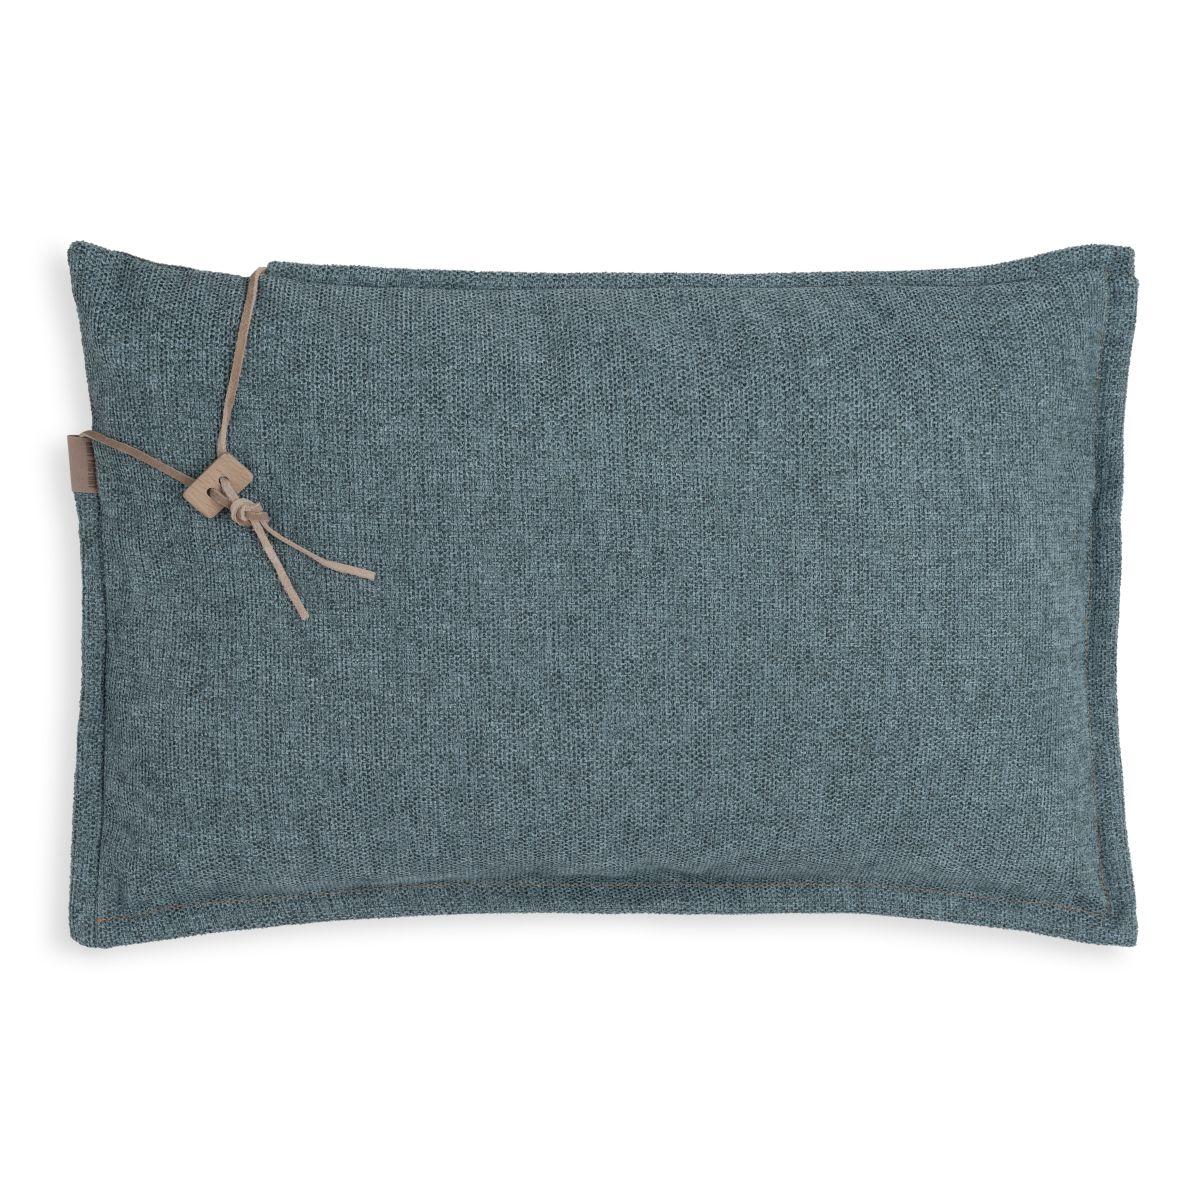 knit factory kf153013013 imre kussen jeans 60x40 1